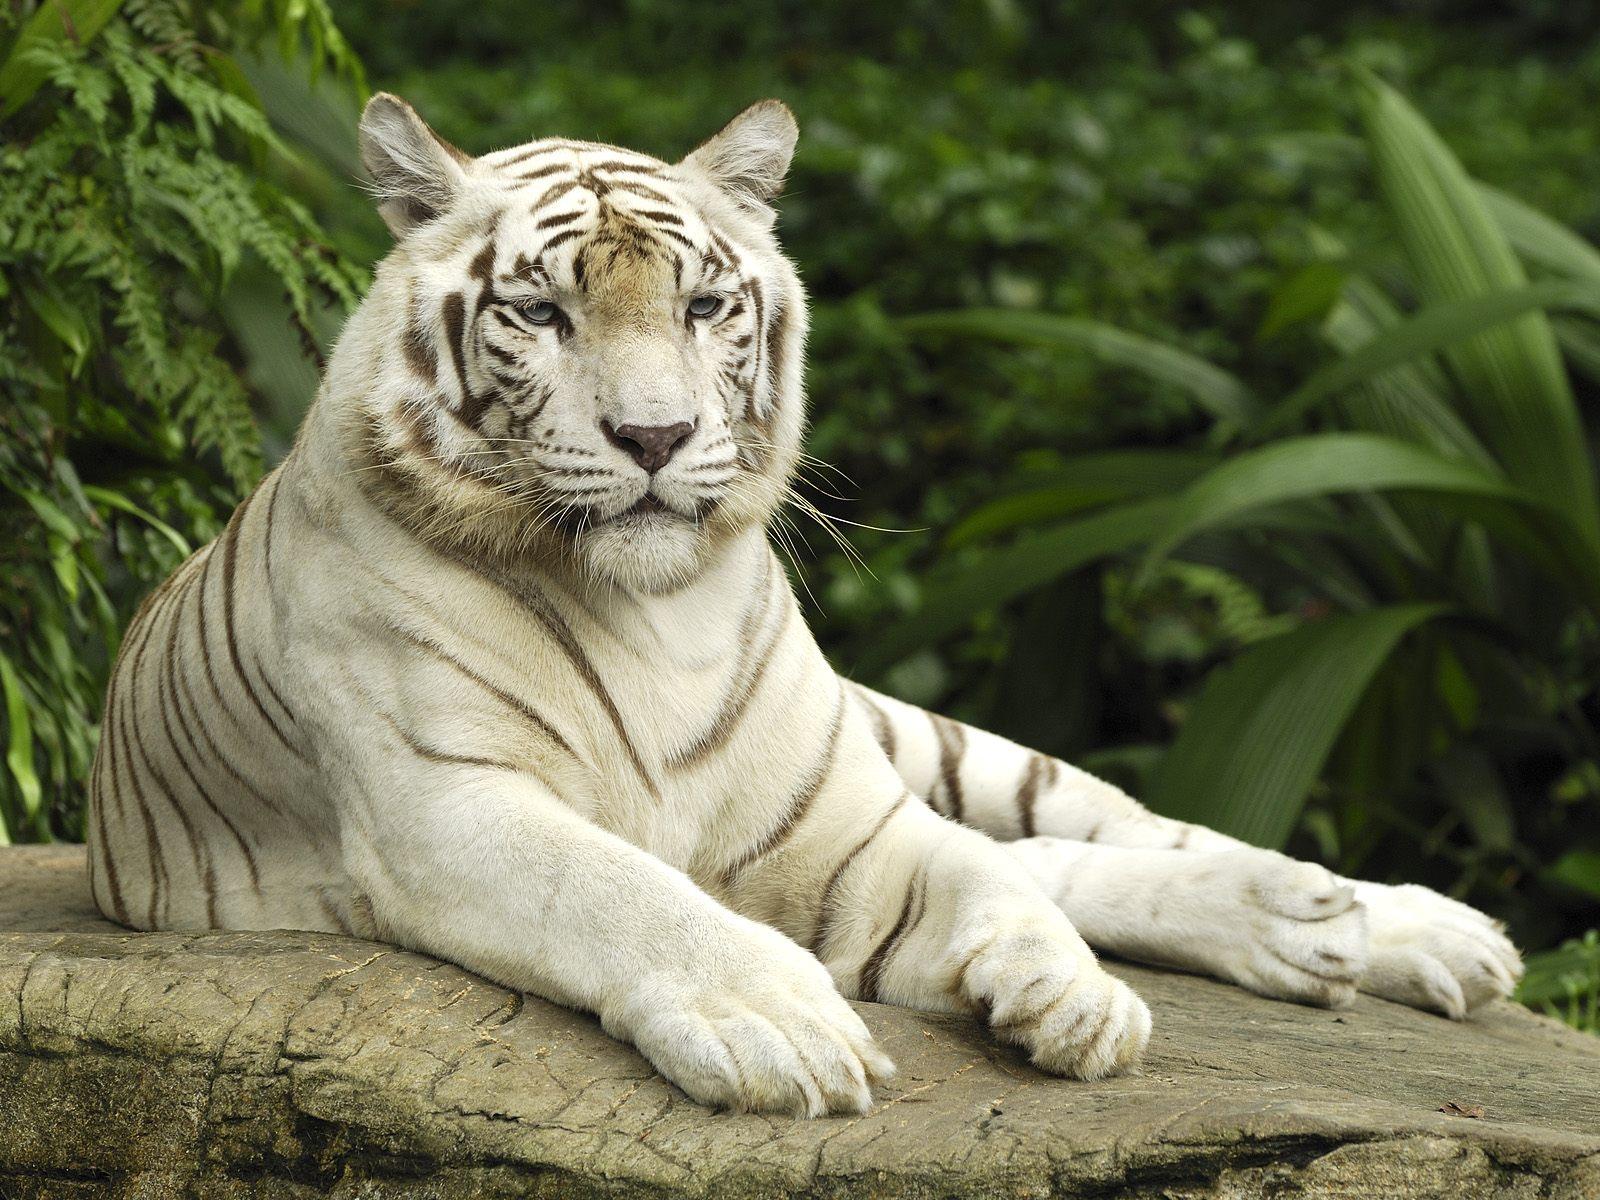 Empress Vitani Beautiful+White+Tigers+Pic+2012+04